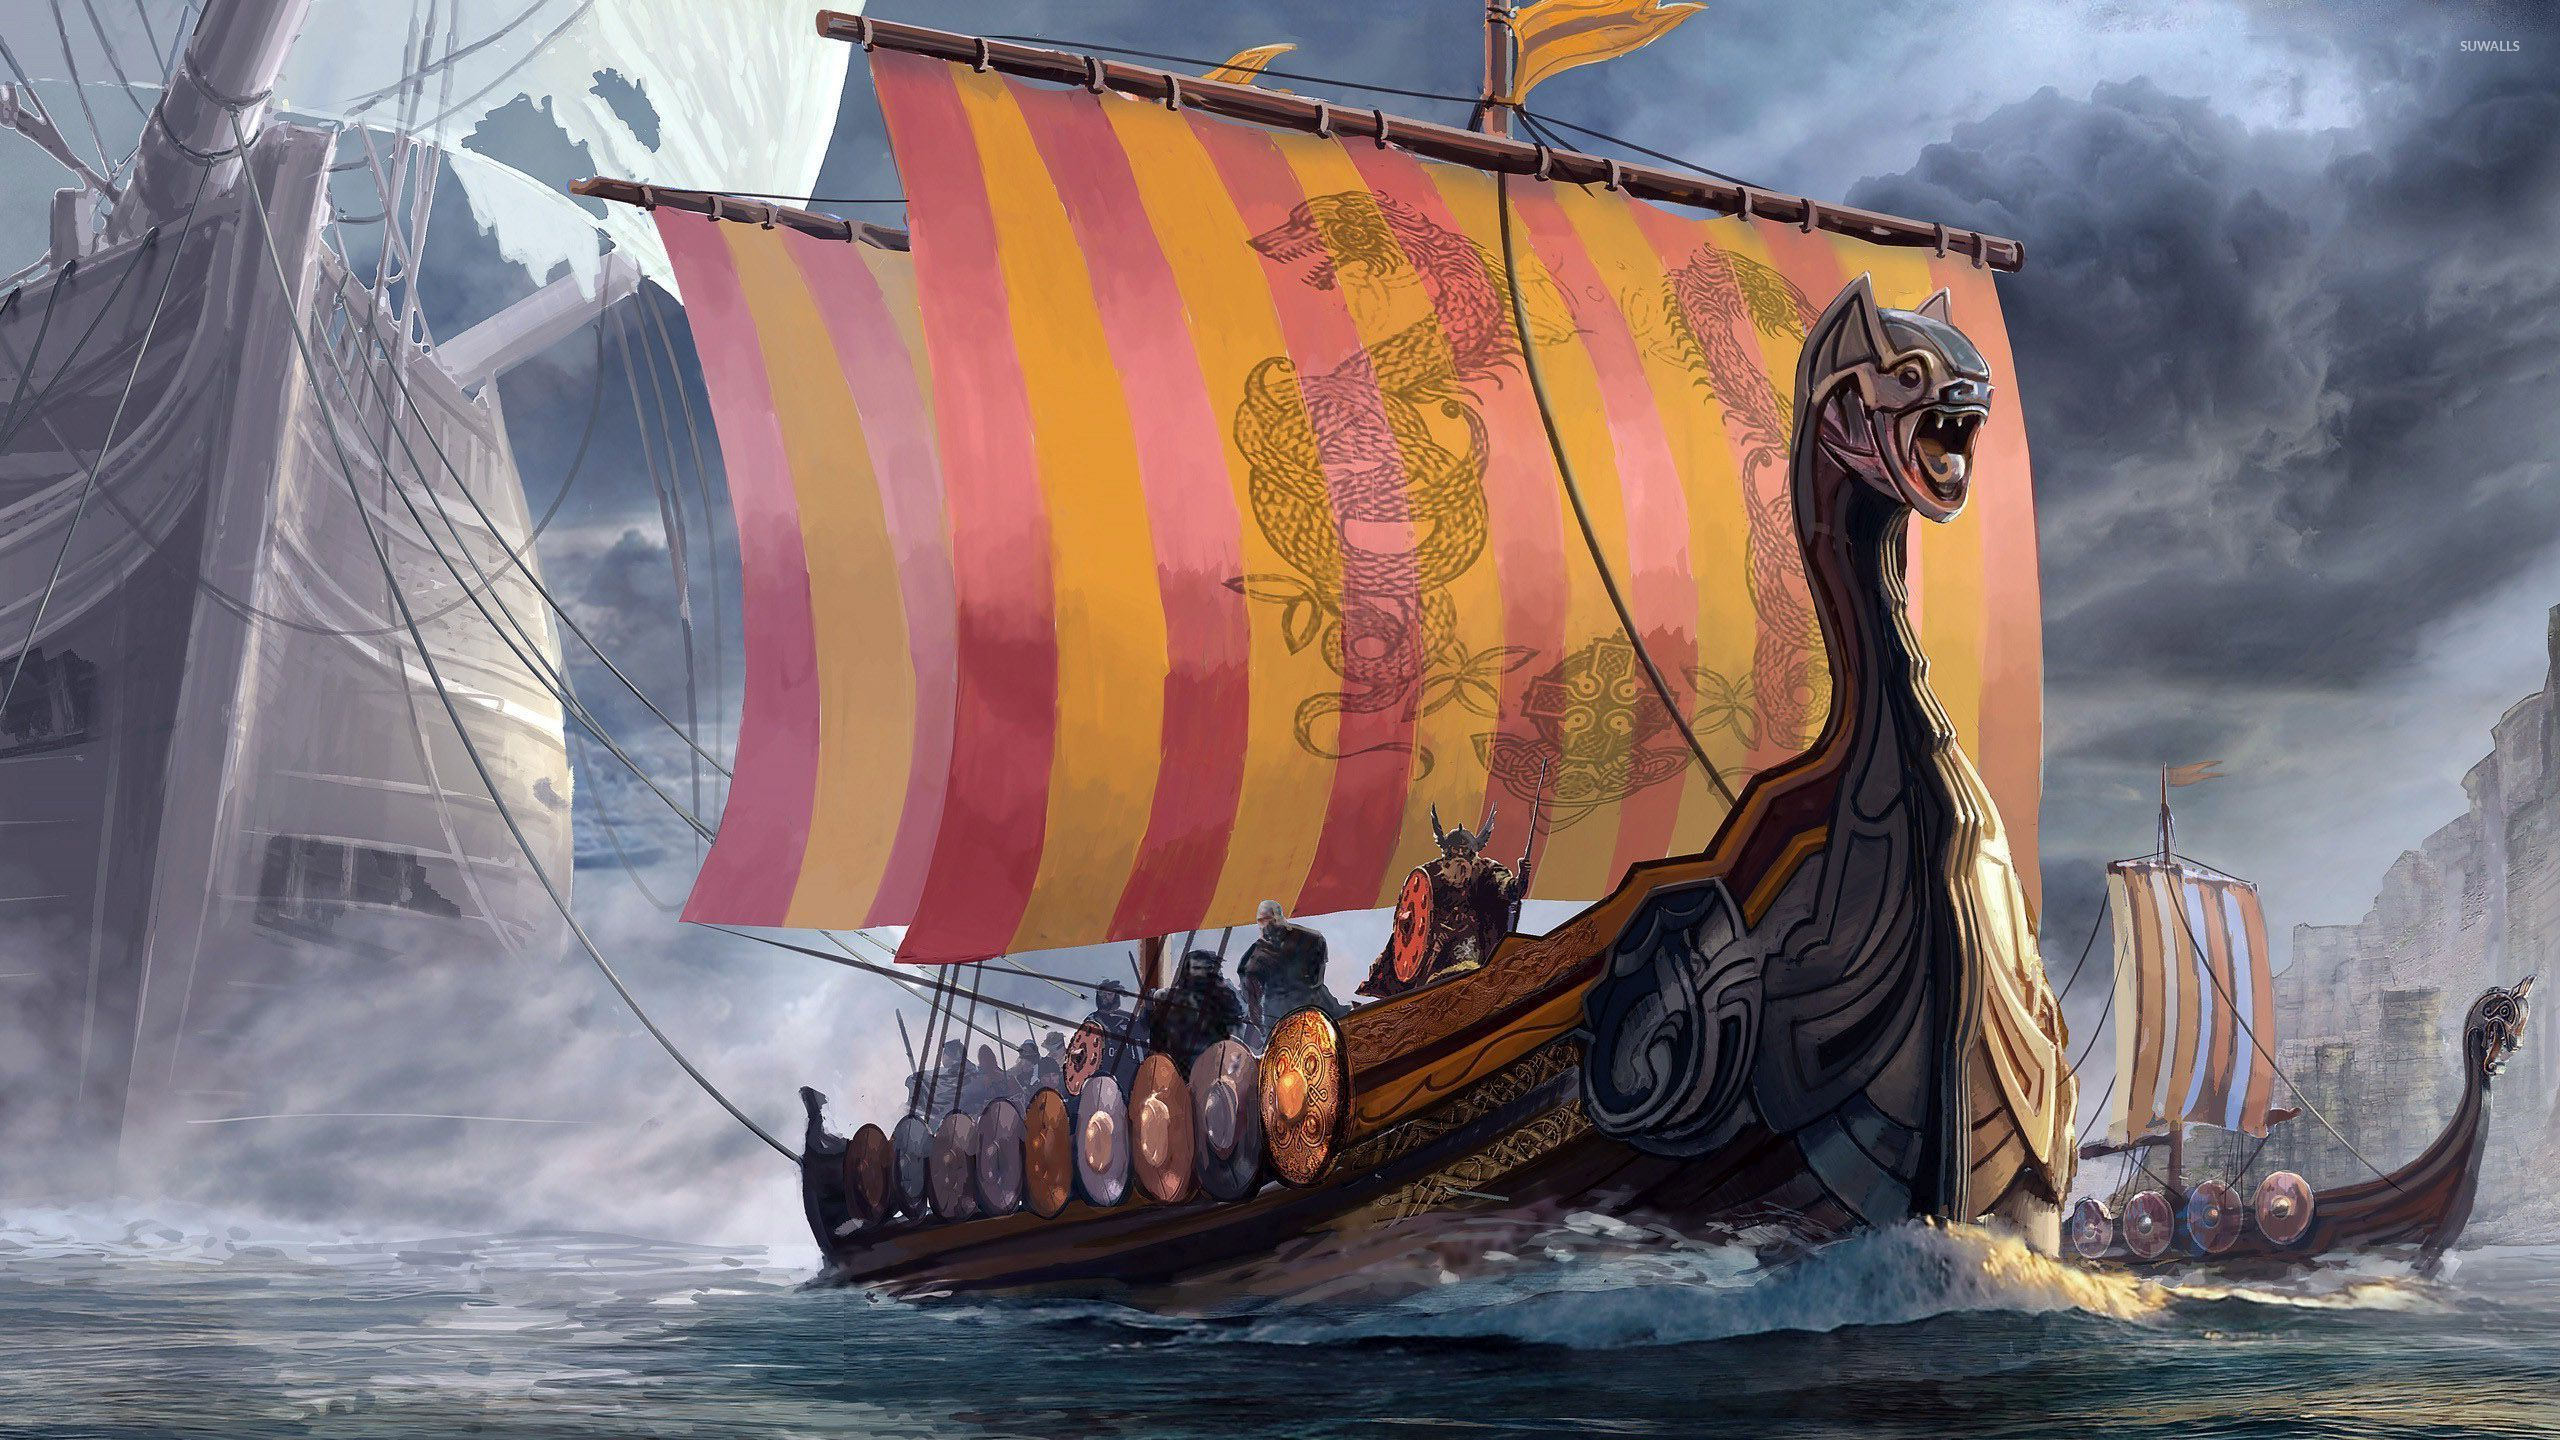 wallpaper viking wallpapers - photo #25